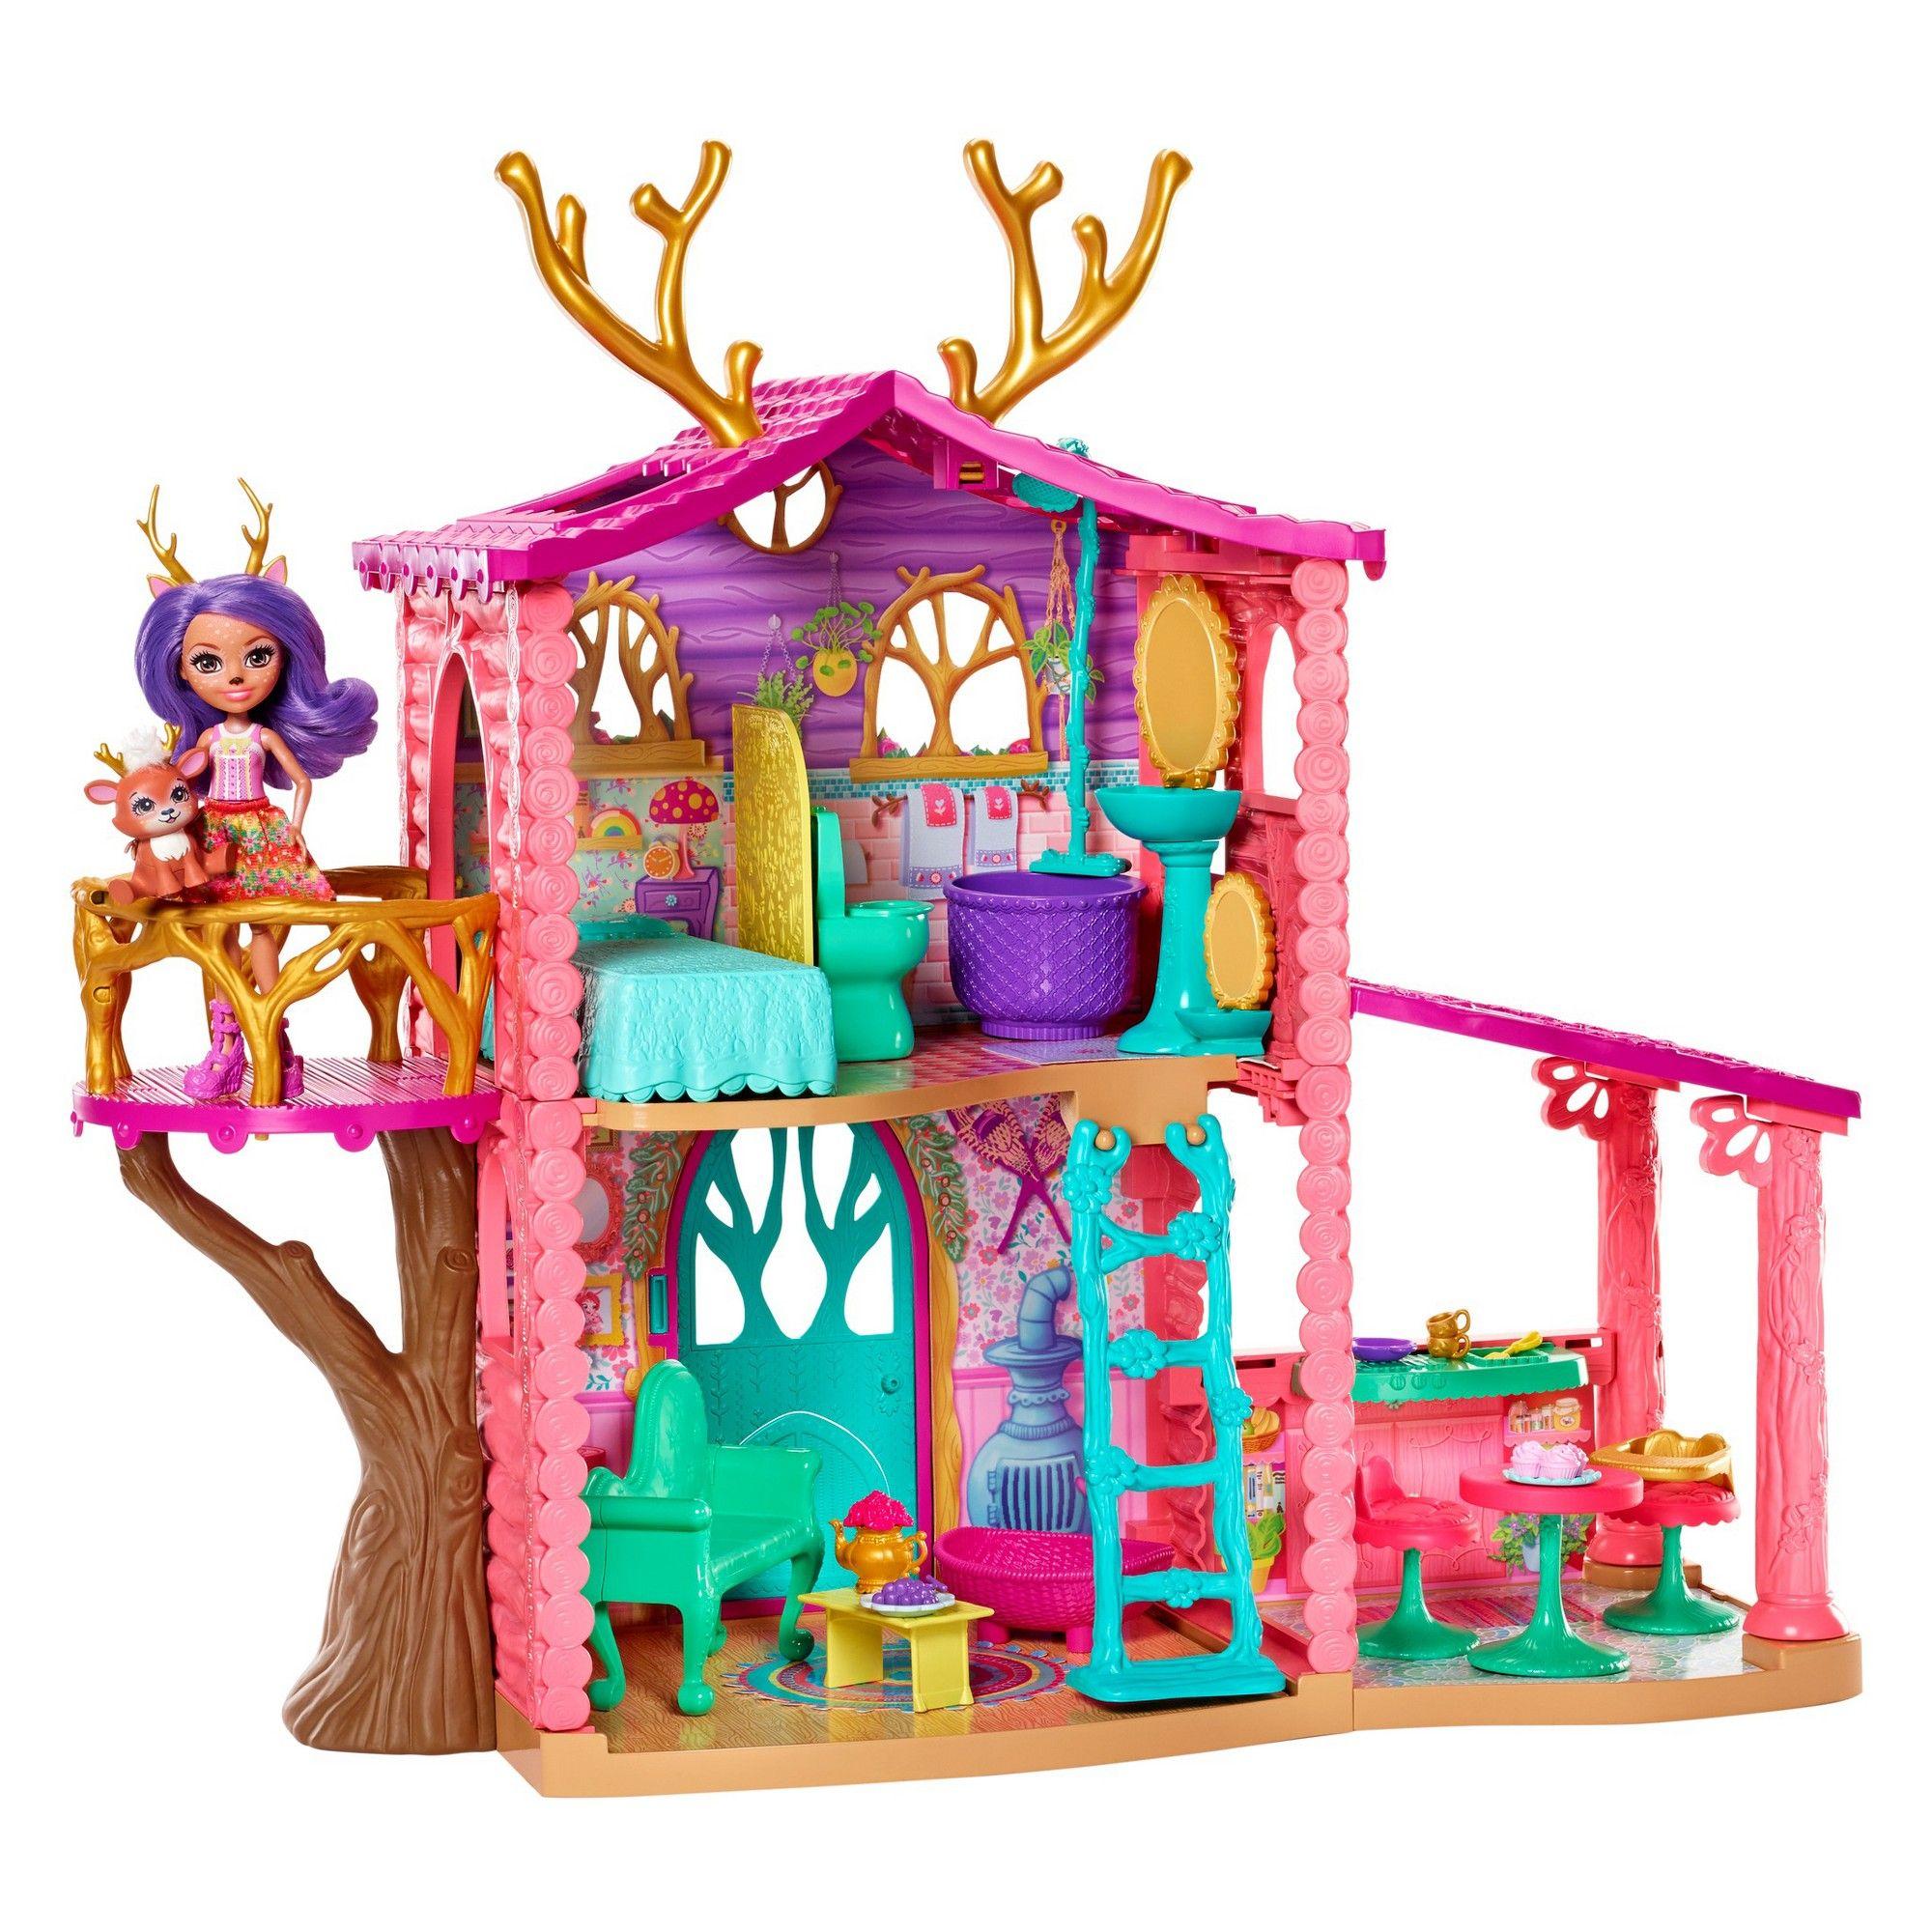 Danessa Deer Doll /& Sprint Figure Enchantimals Cozy Deer House Playset